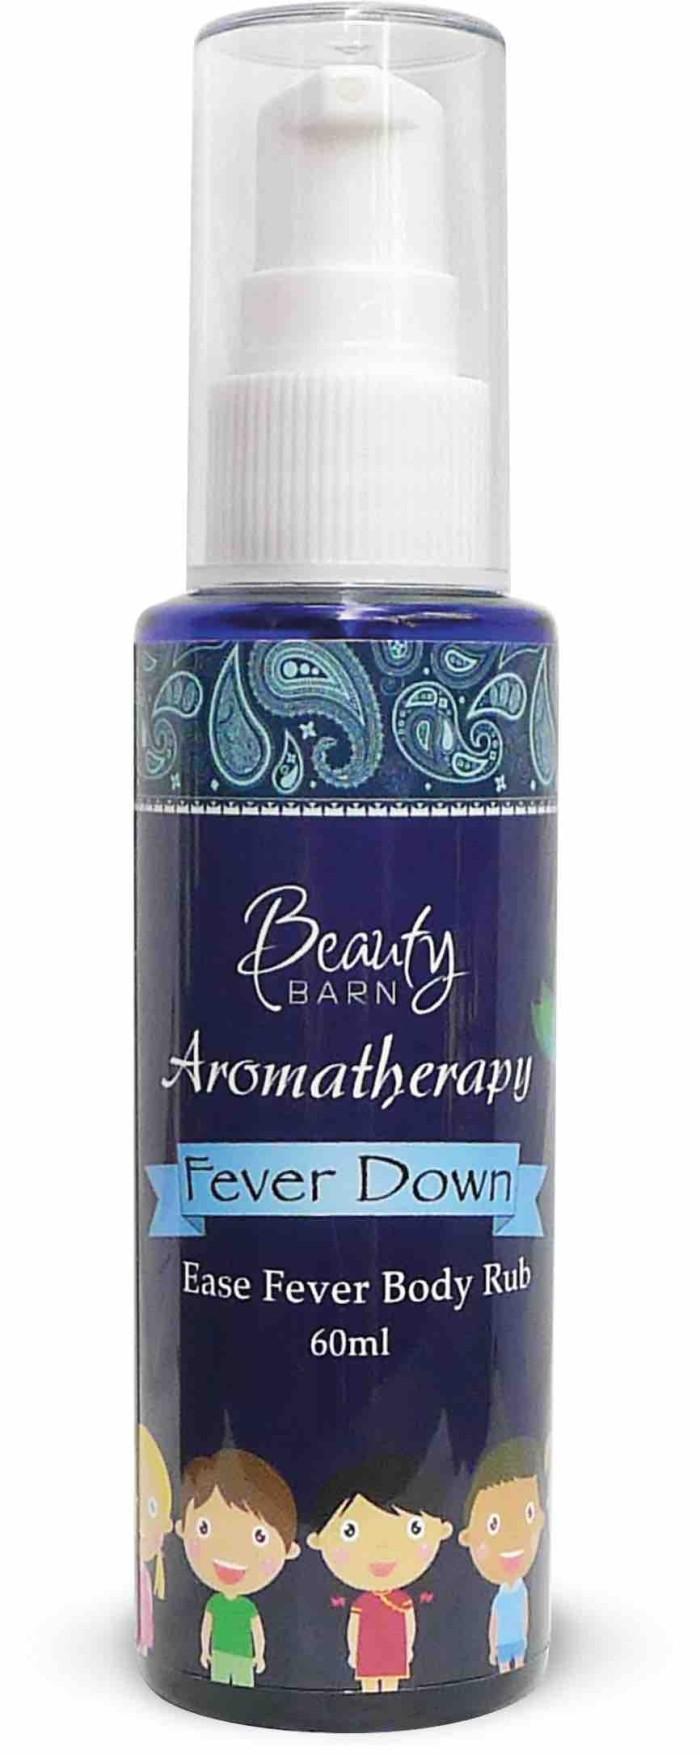 Beauty Barn Fever Down 60ml Daftar Harga Terlengkap Indonesia Aromatherapy Feeve 30ml